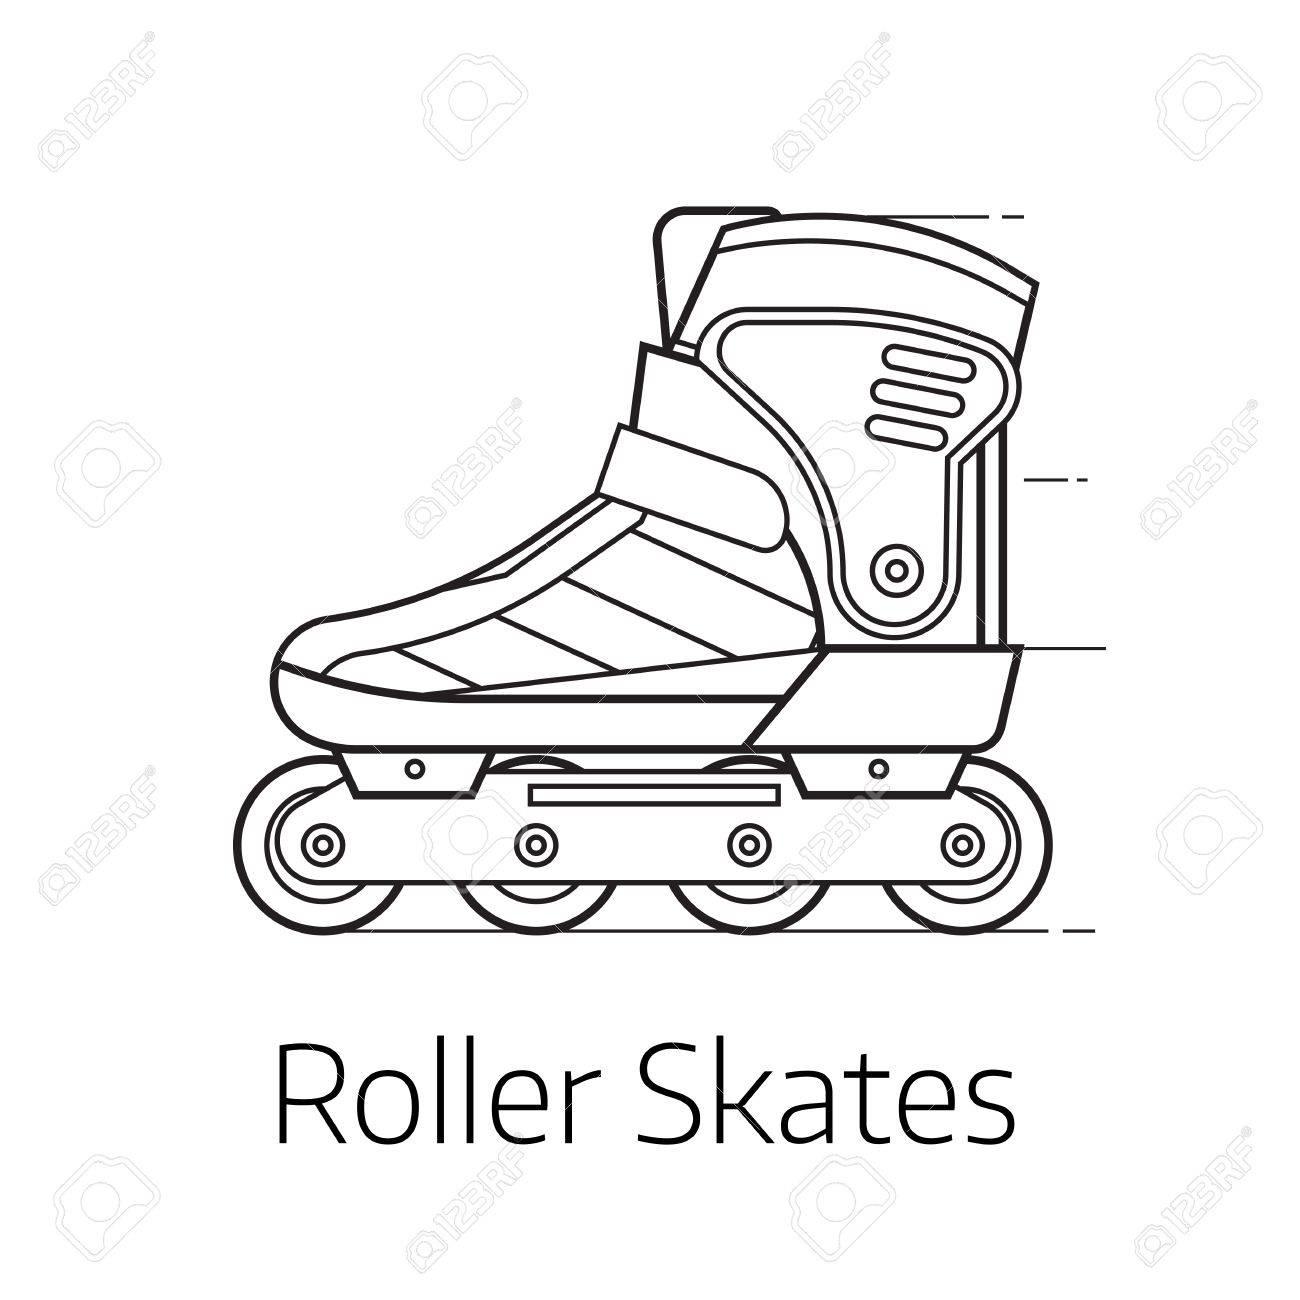 1300x1300 Modern Roller Skates Vector Illustration. Alternative City